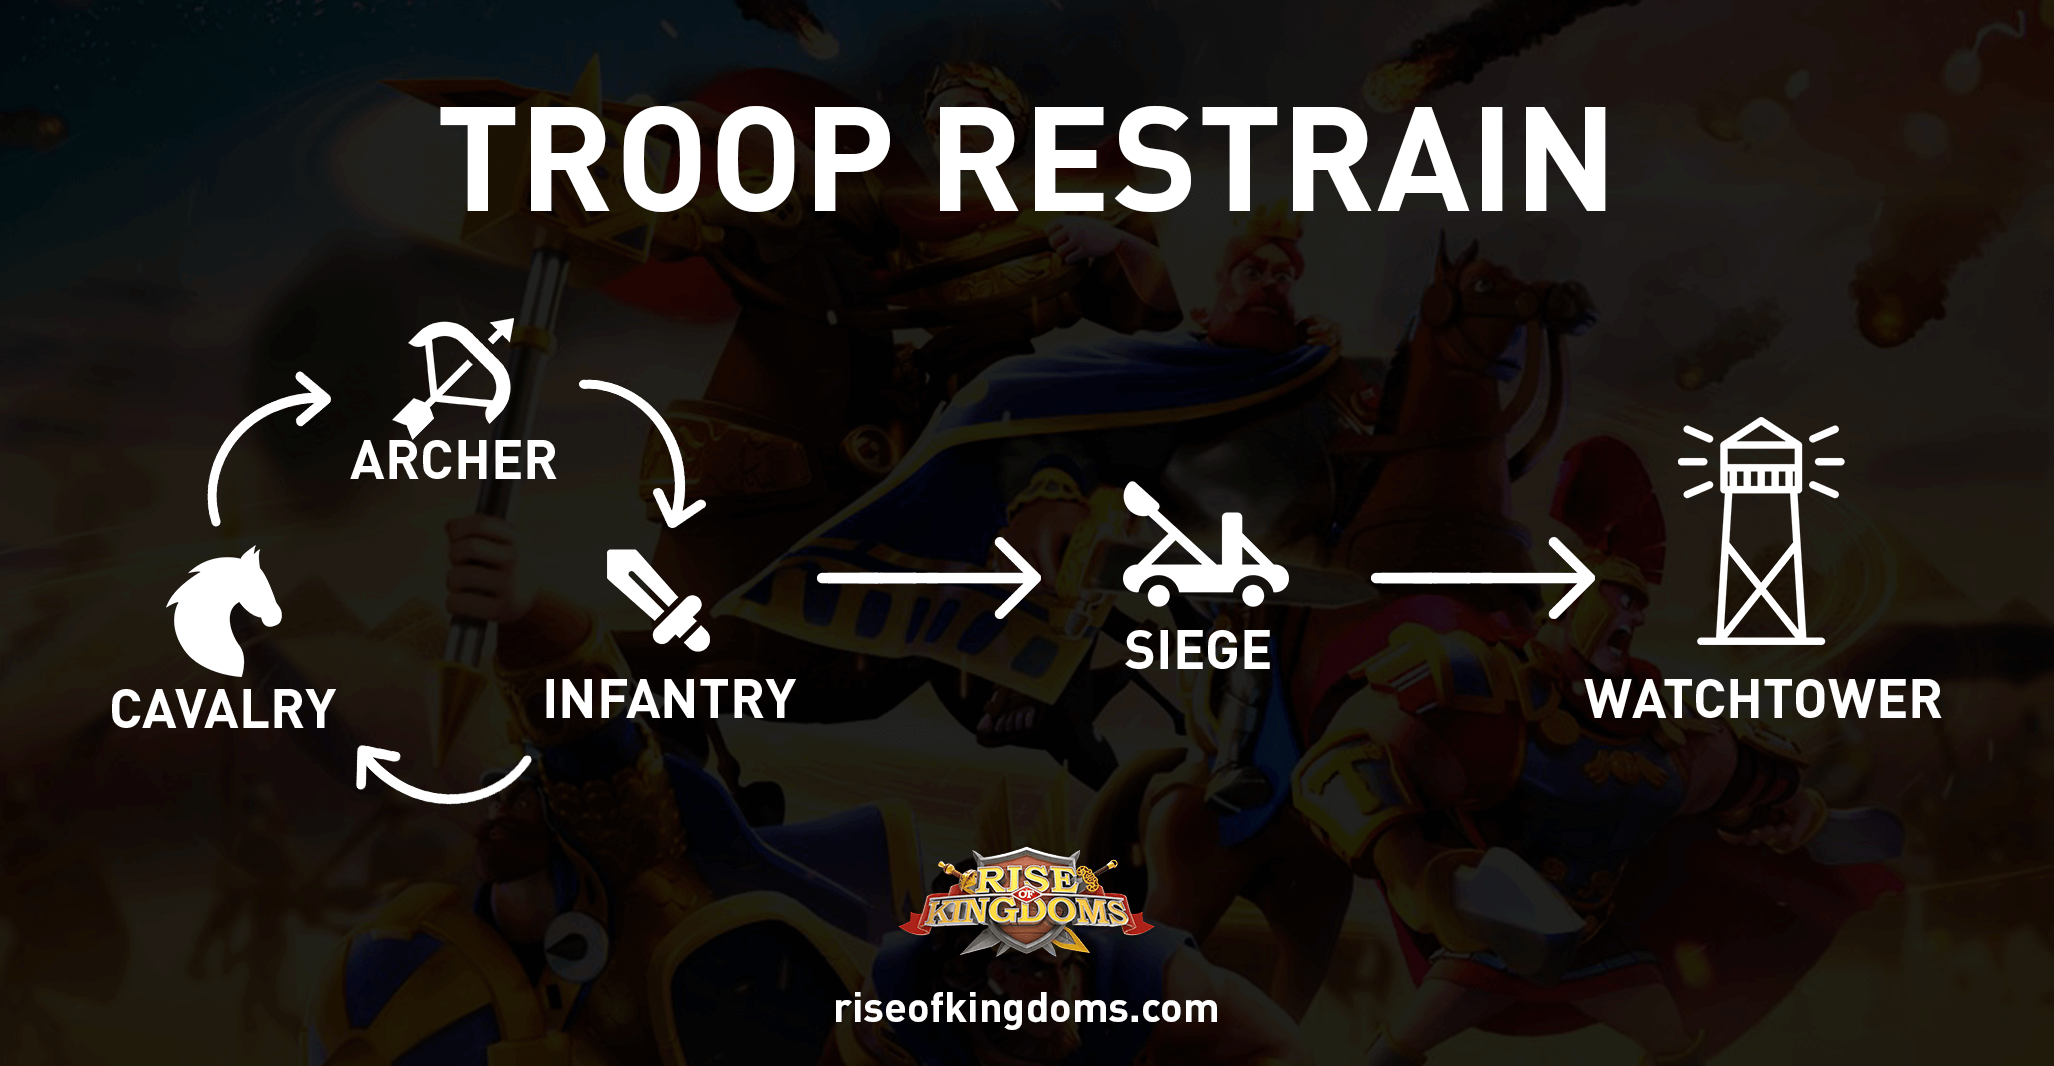 rise of kingdoms troops restrain